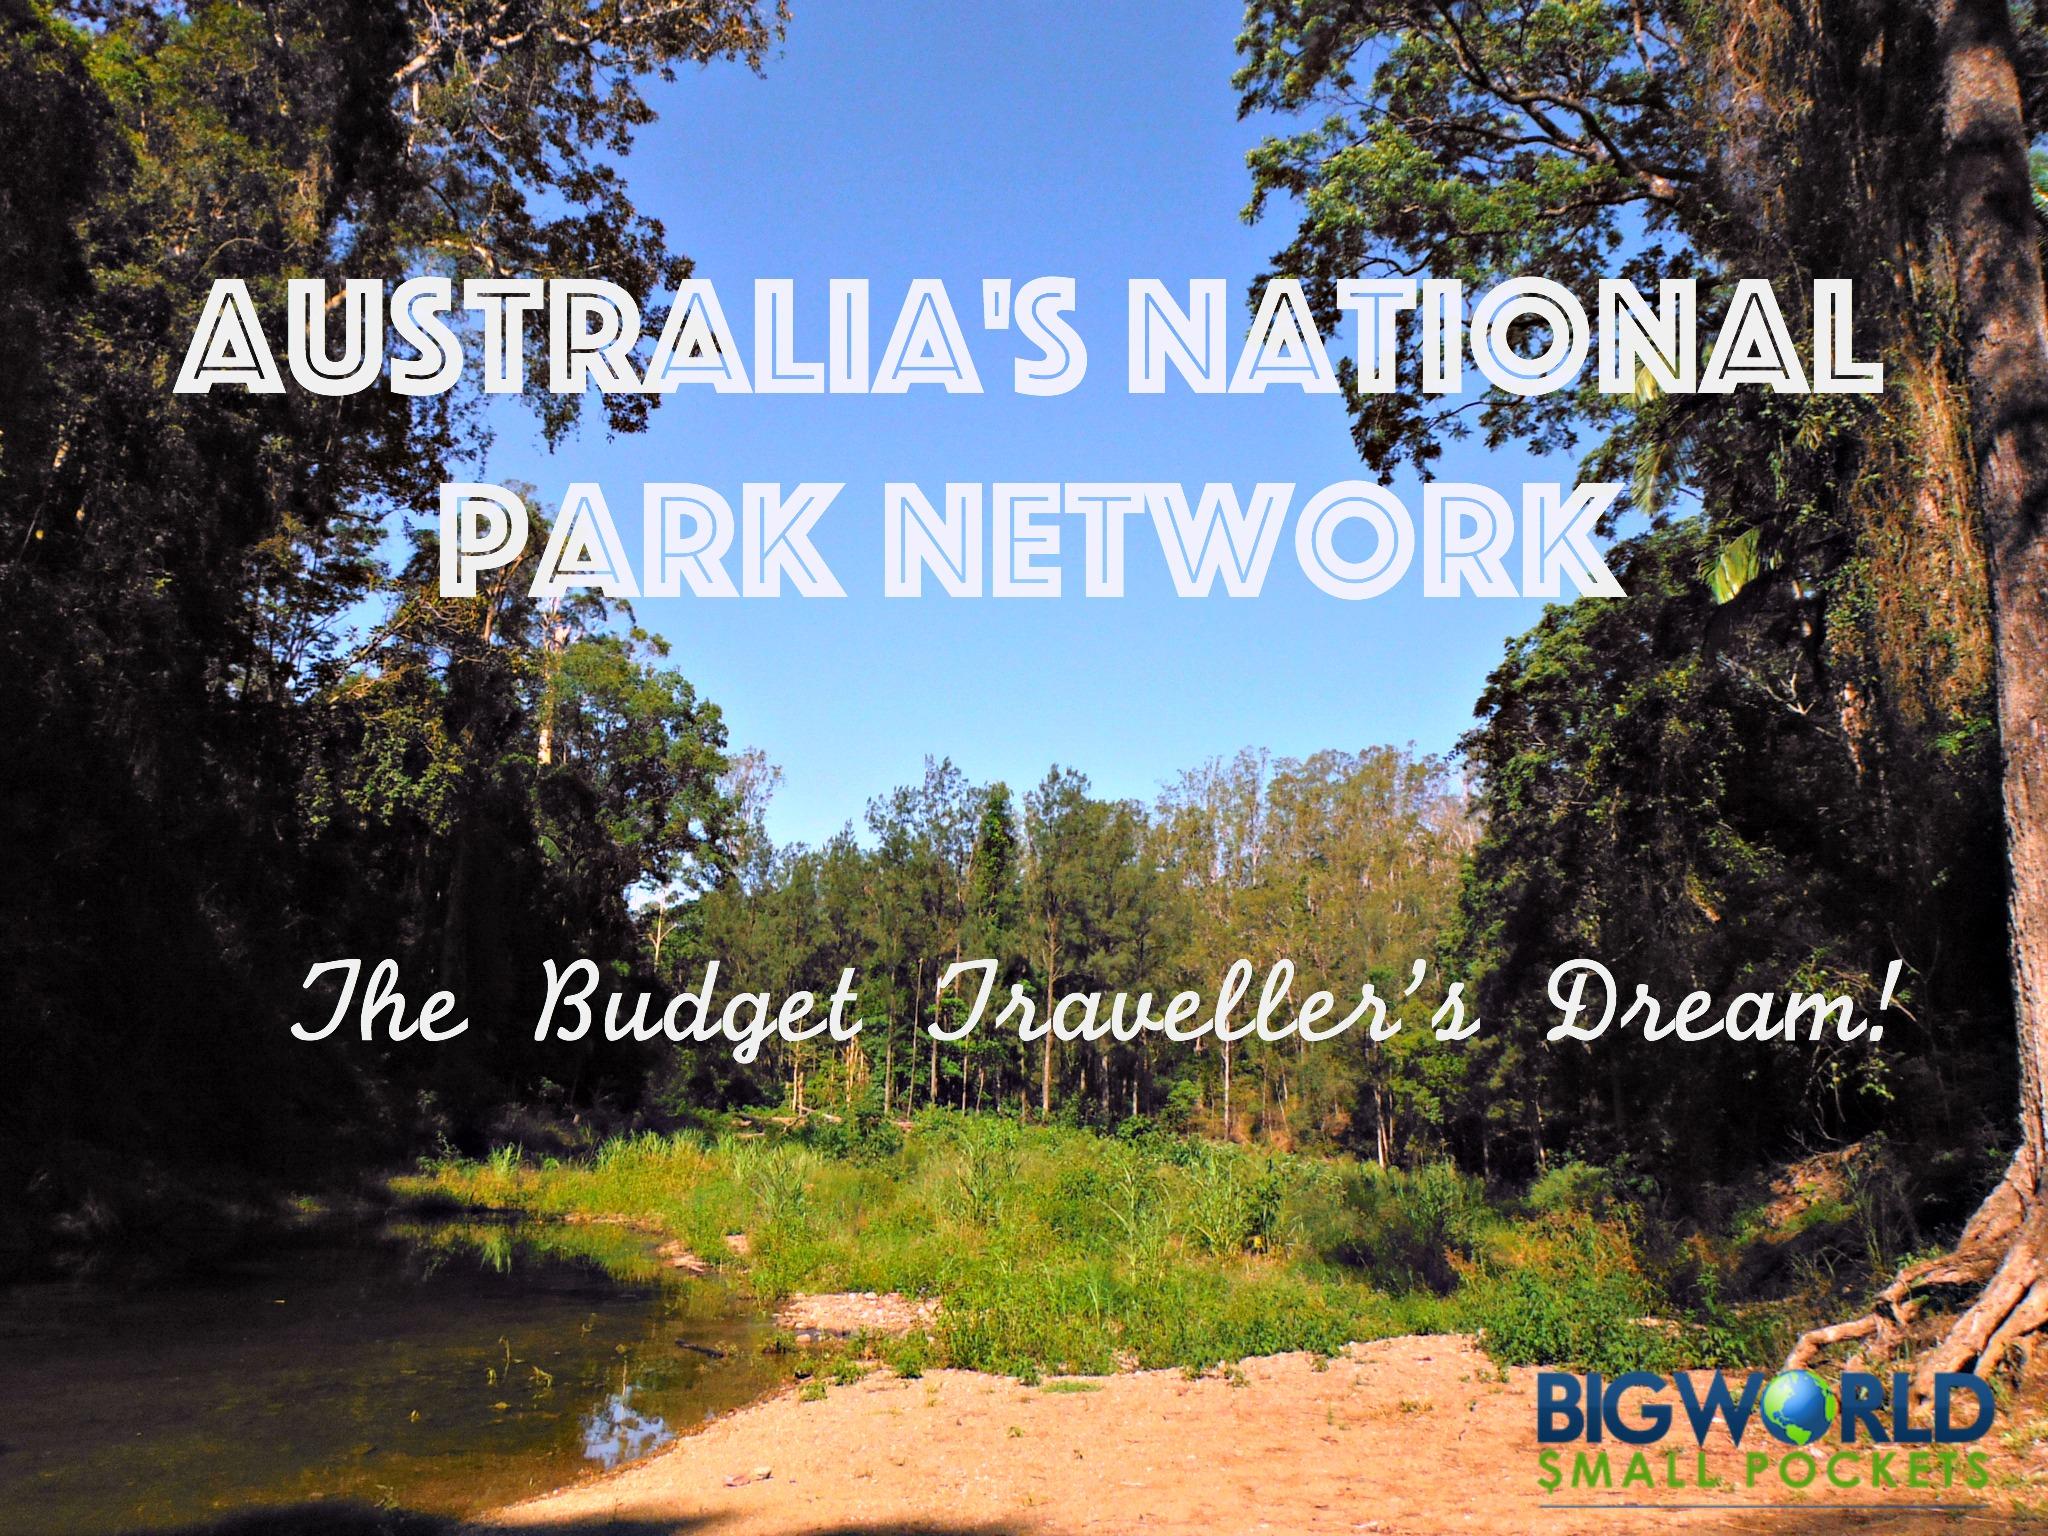 Australia's National Park Network